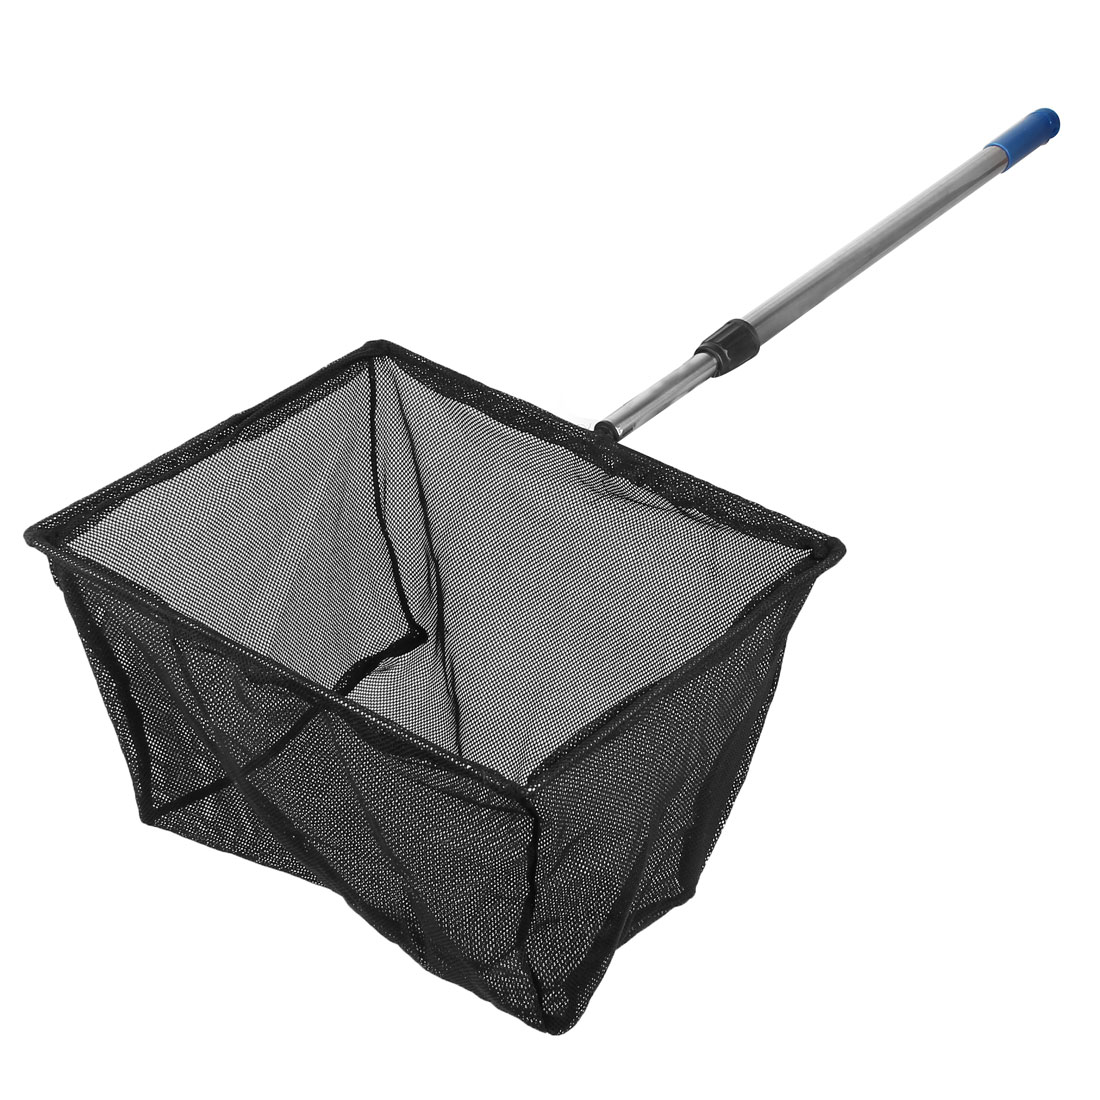 Telescopic Stainess Steel Handle Foldable Fishing Landing Net